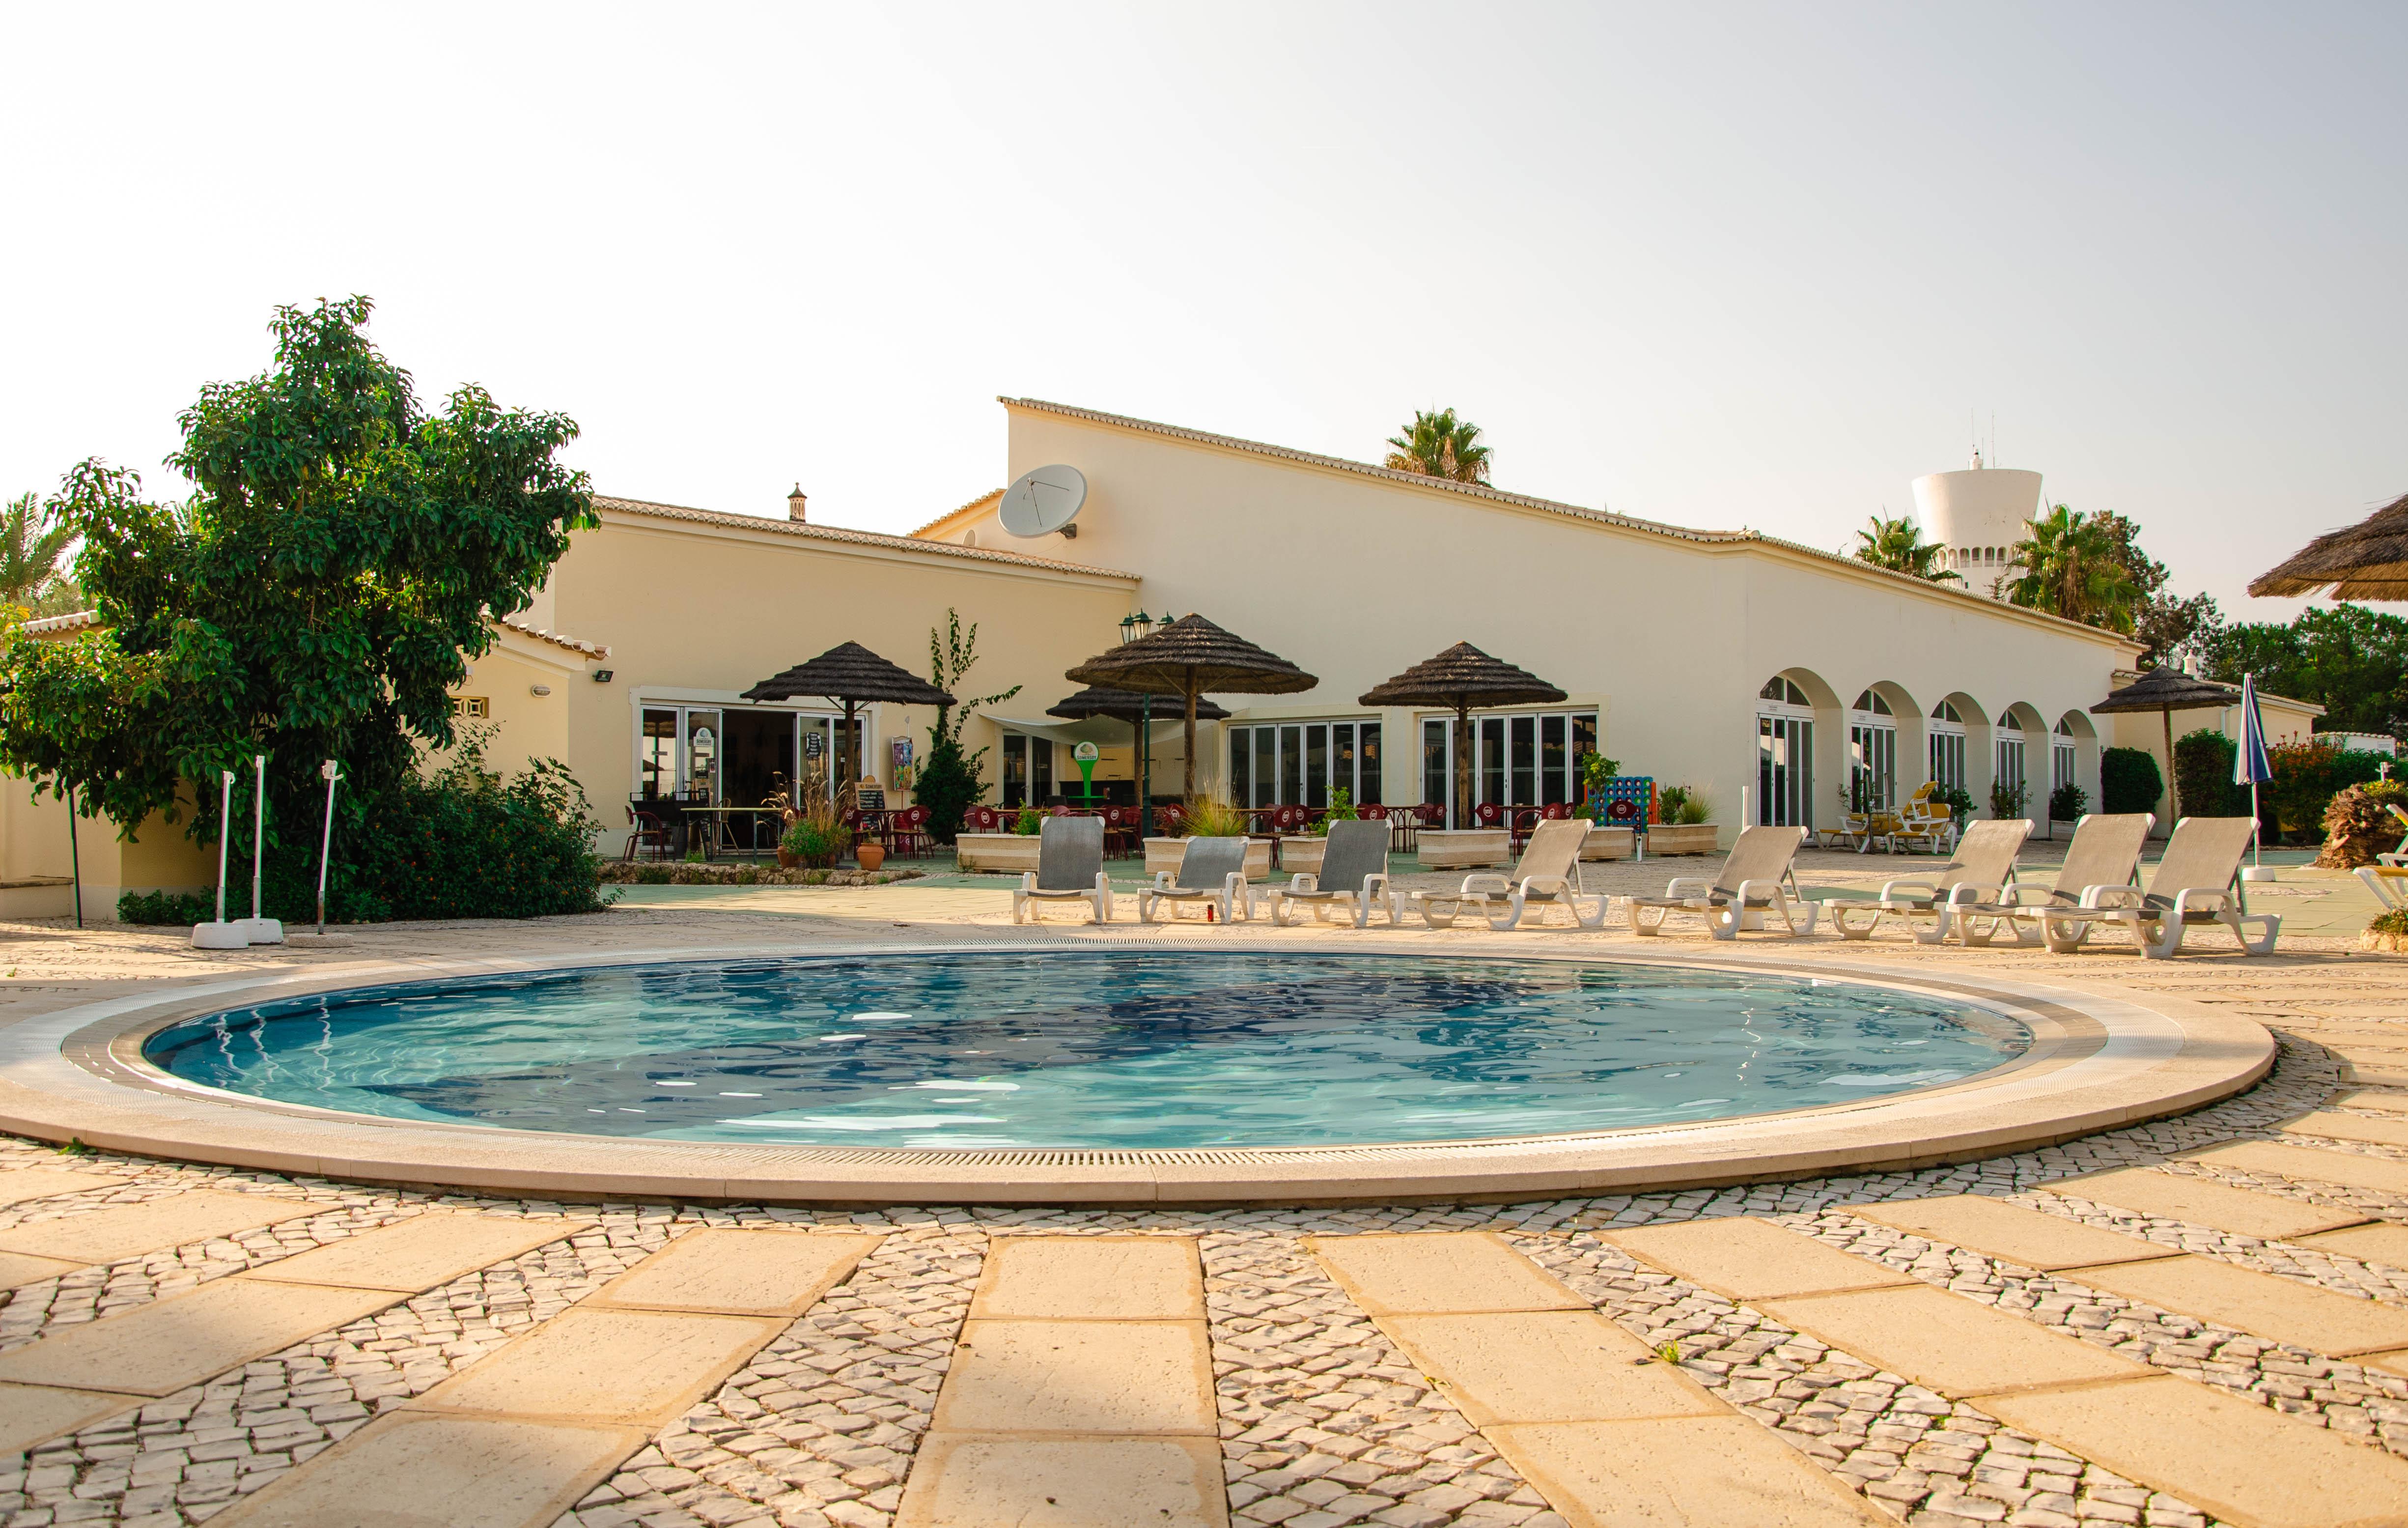 Oasis Parque Babies pool